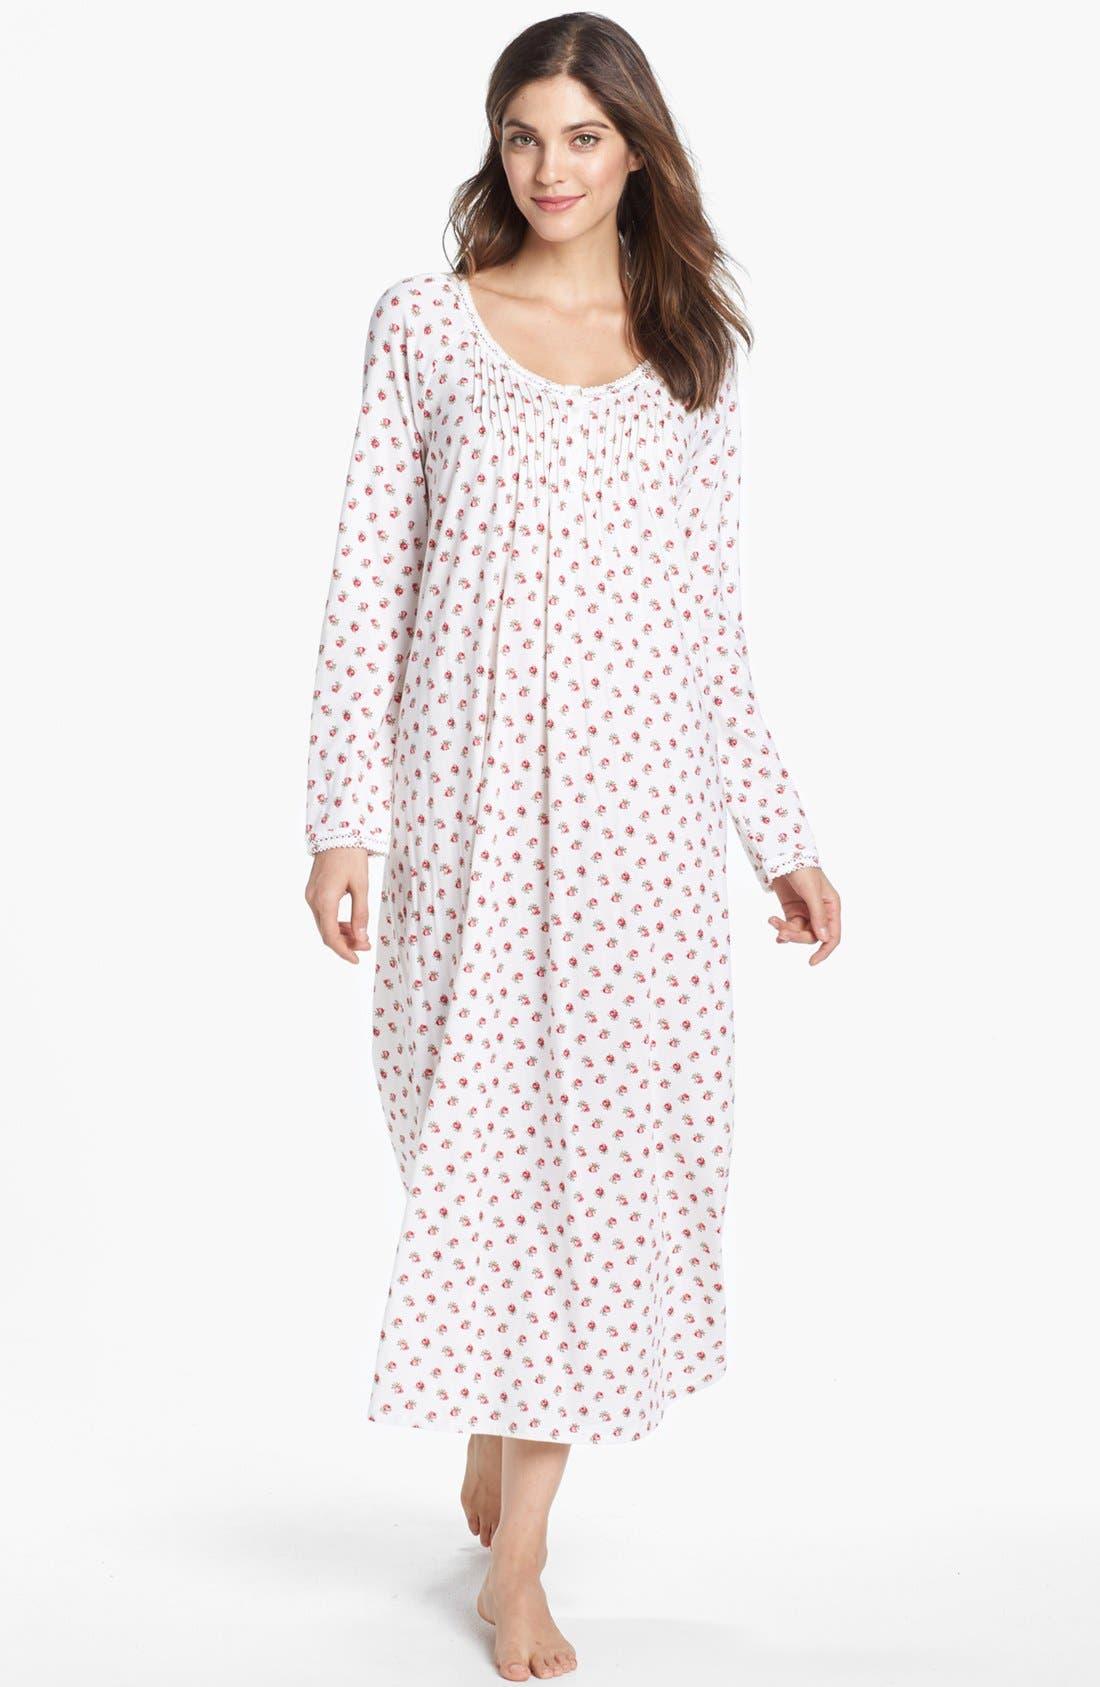 Main Image - Carole Hochman Designs 'Rosebud Cherubs' Nightgown